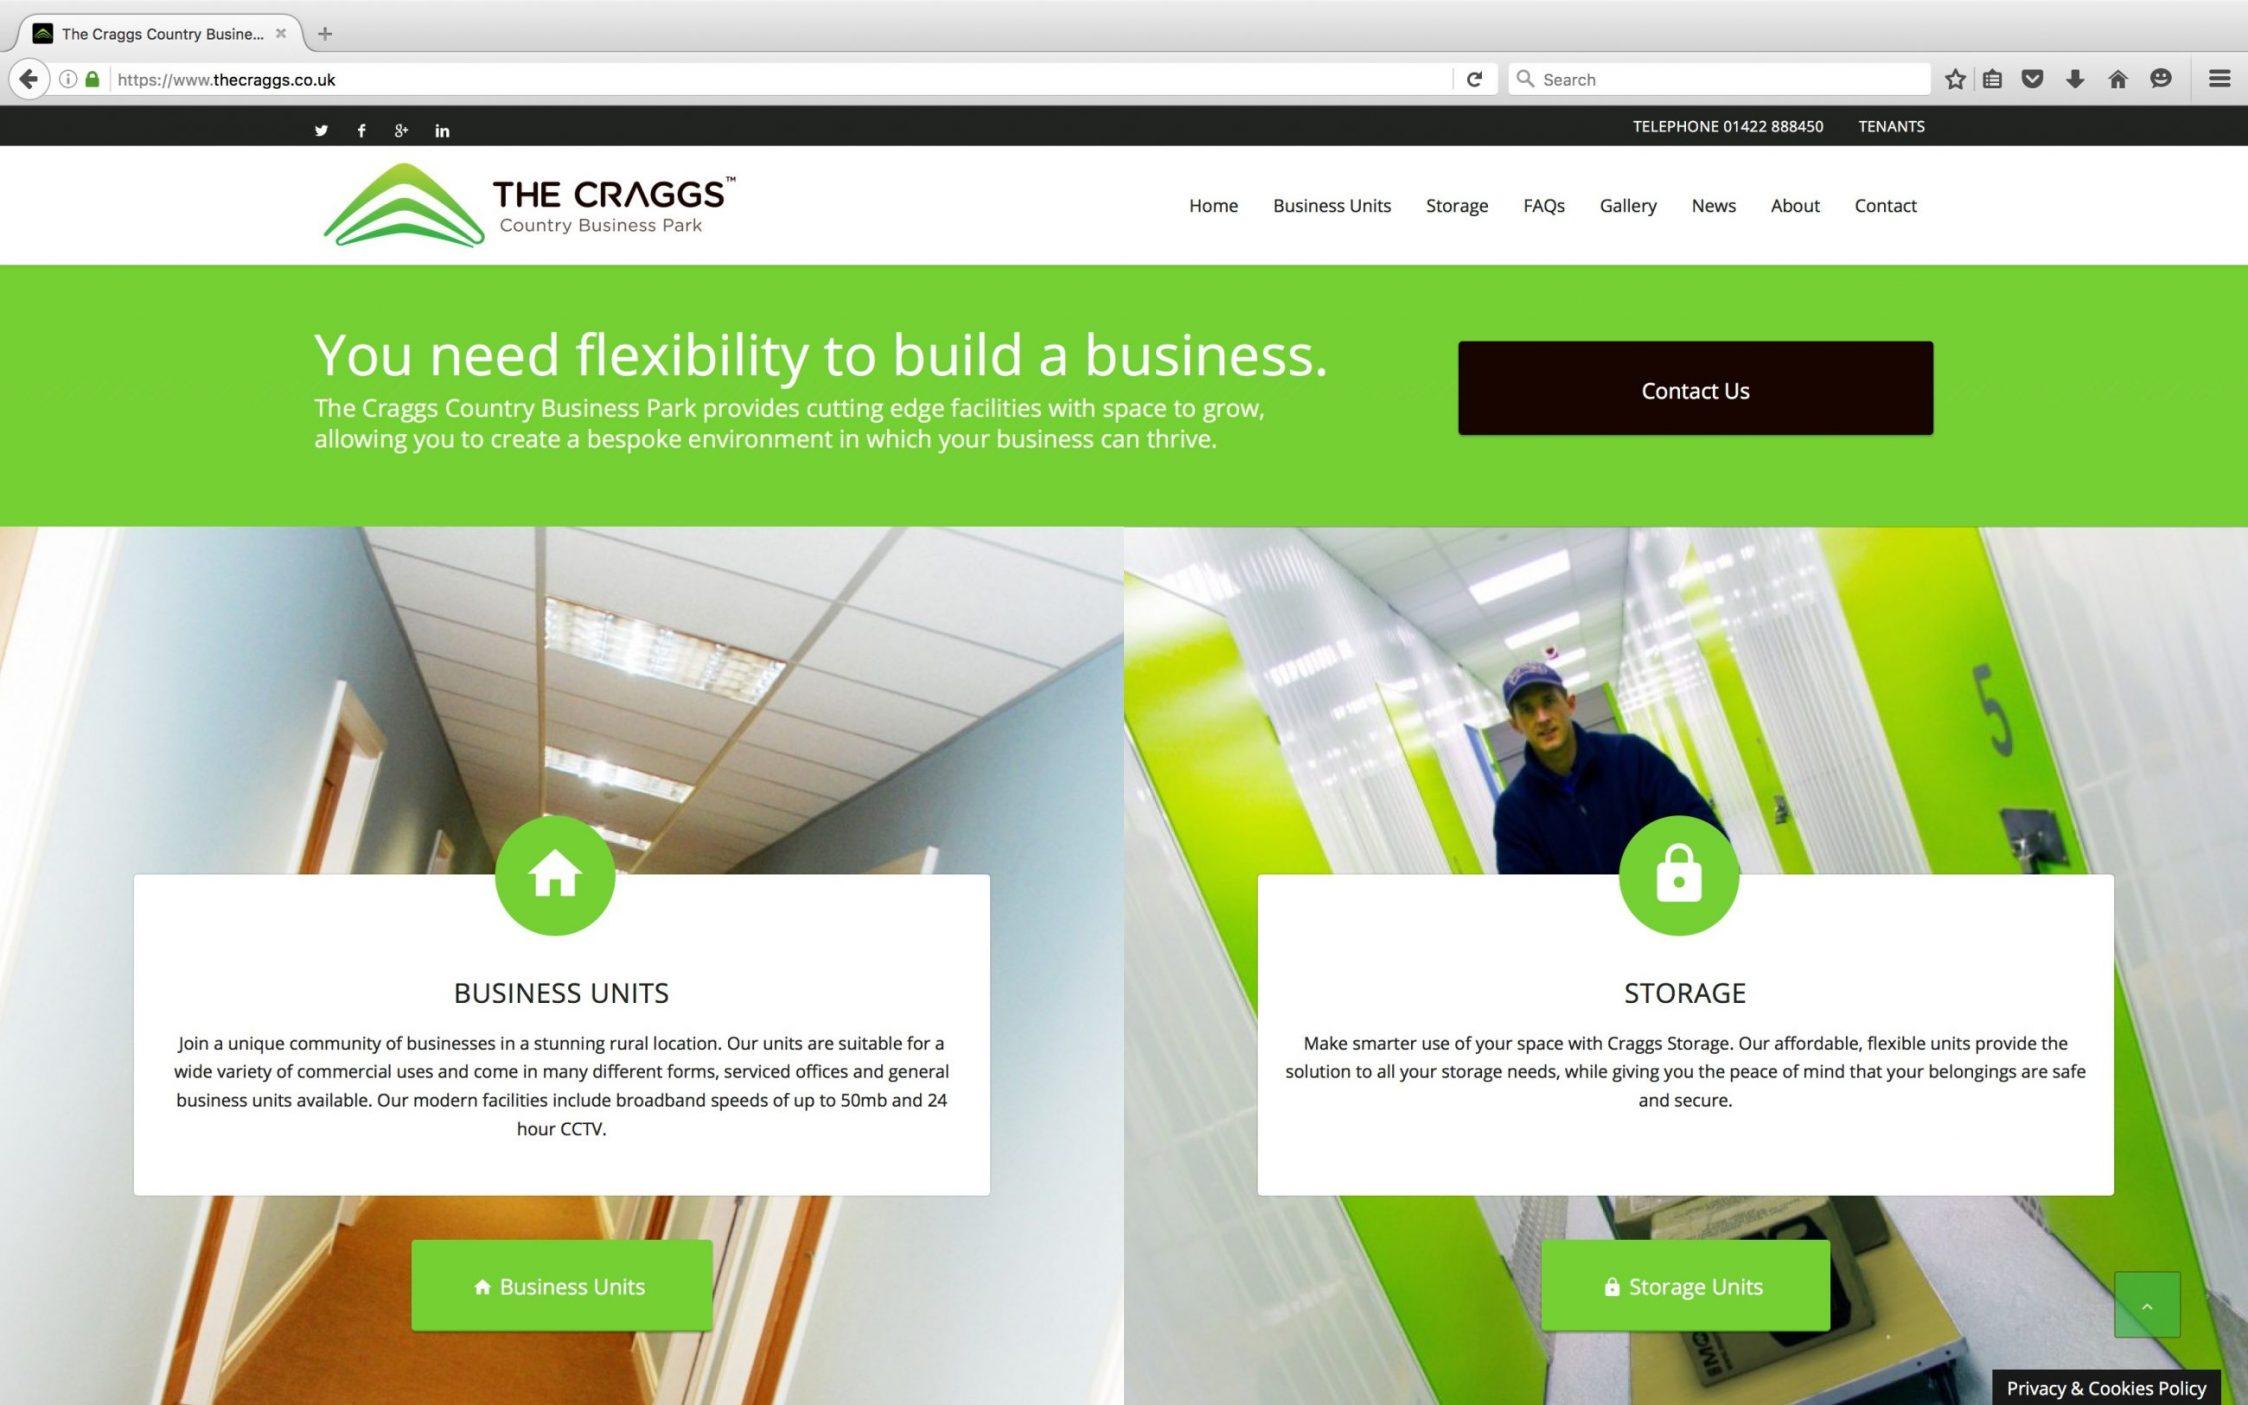 Screen Shot 2016 03 21 at 15.21.53 - Website design for business park in Yorkshire